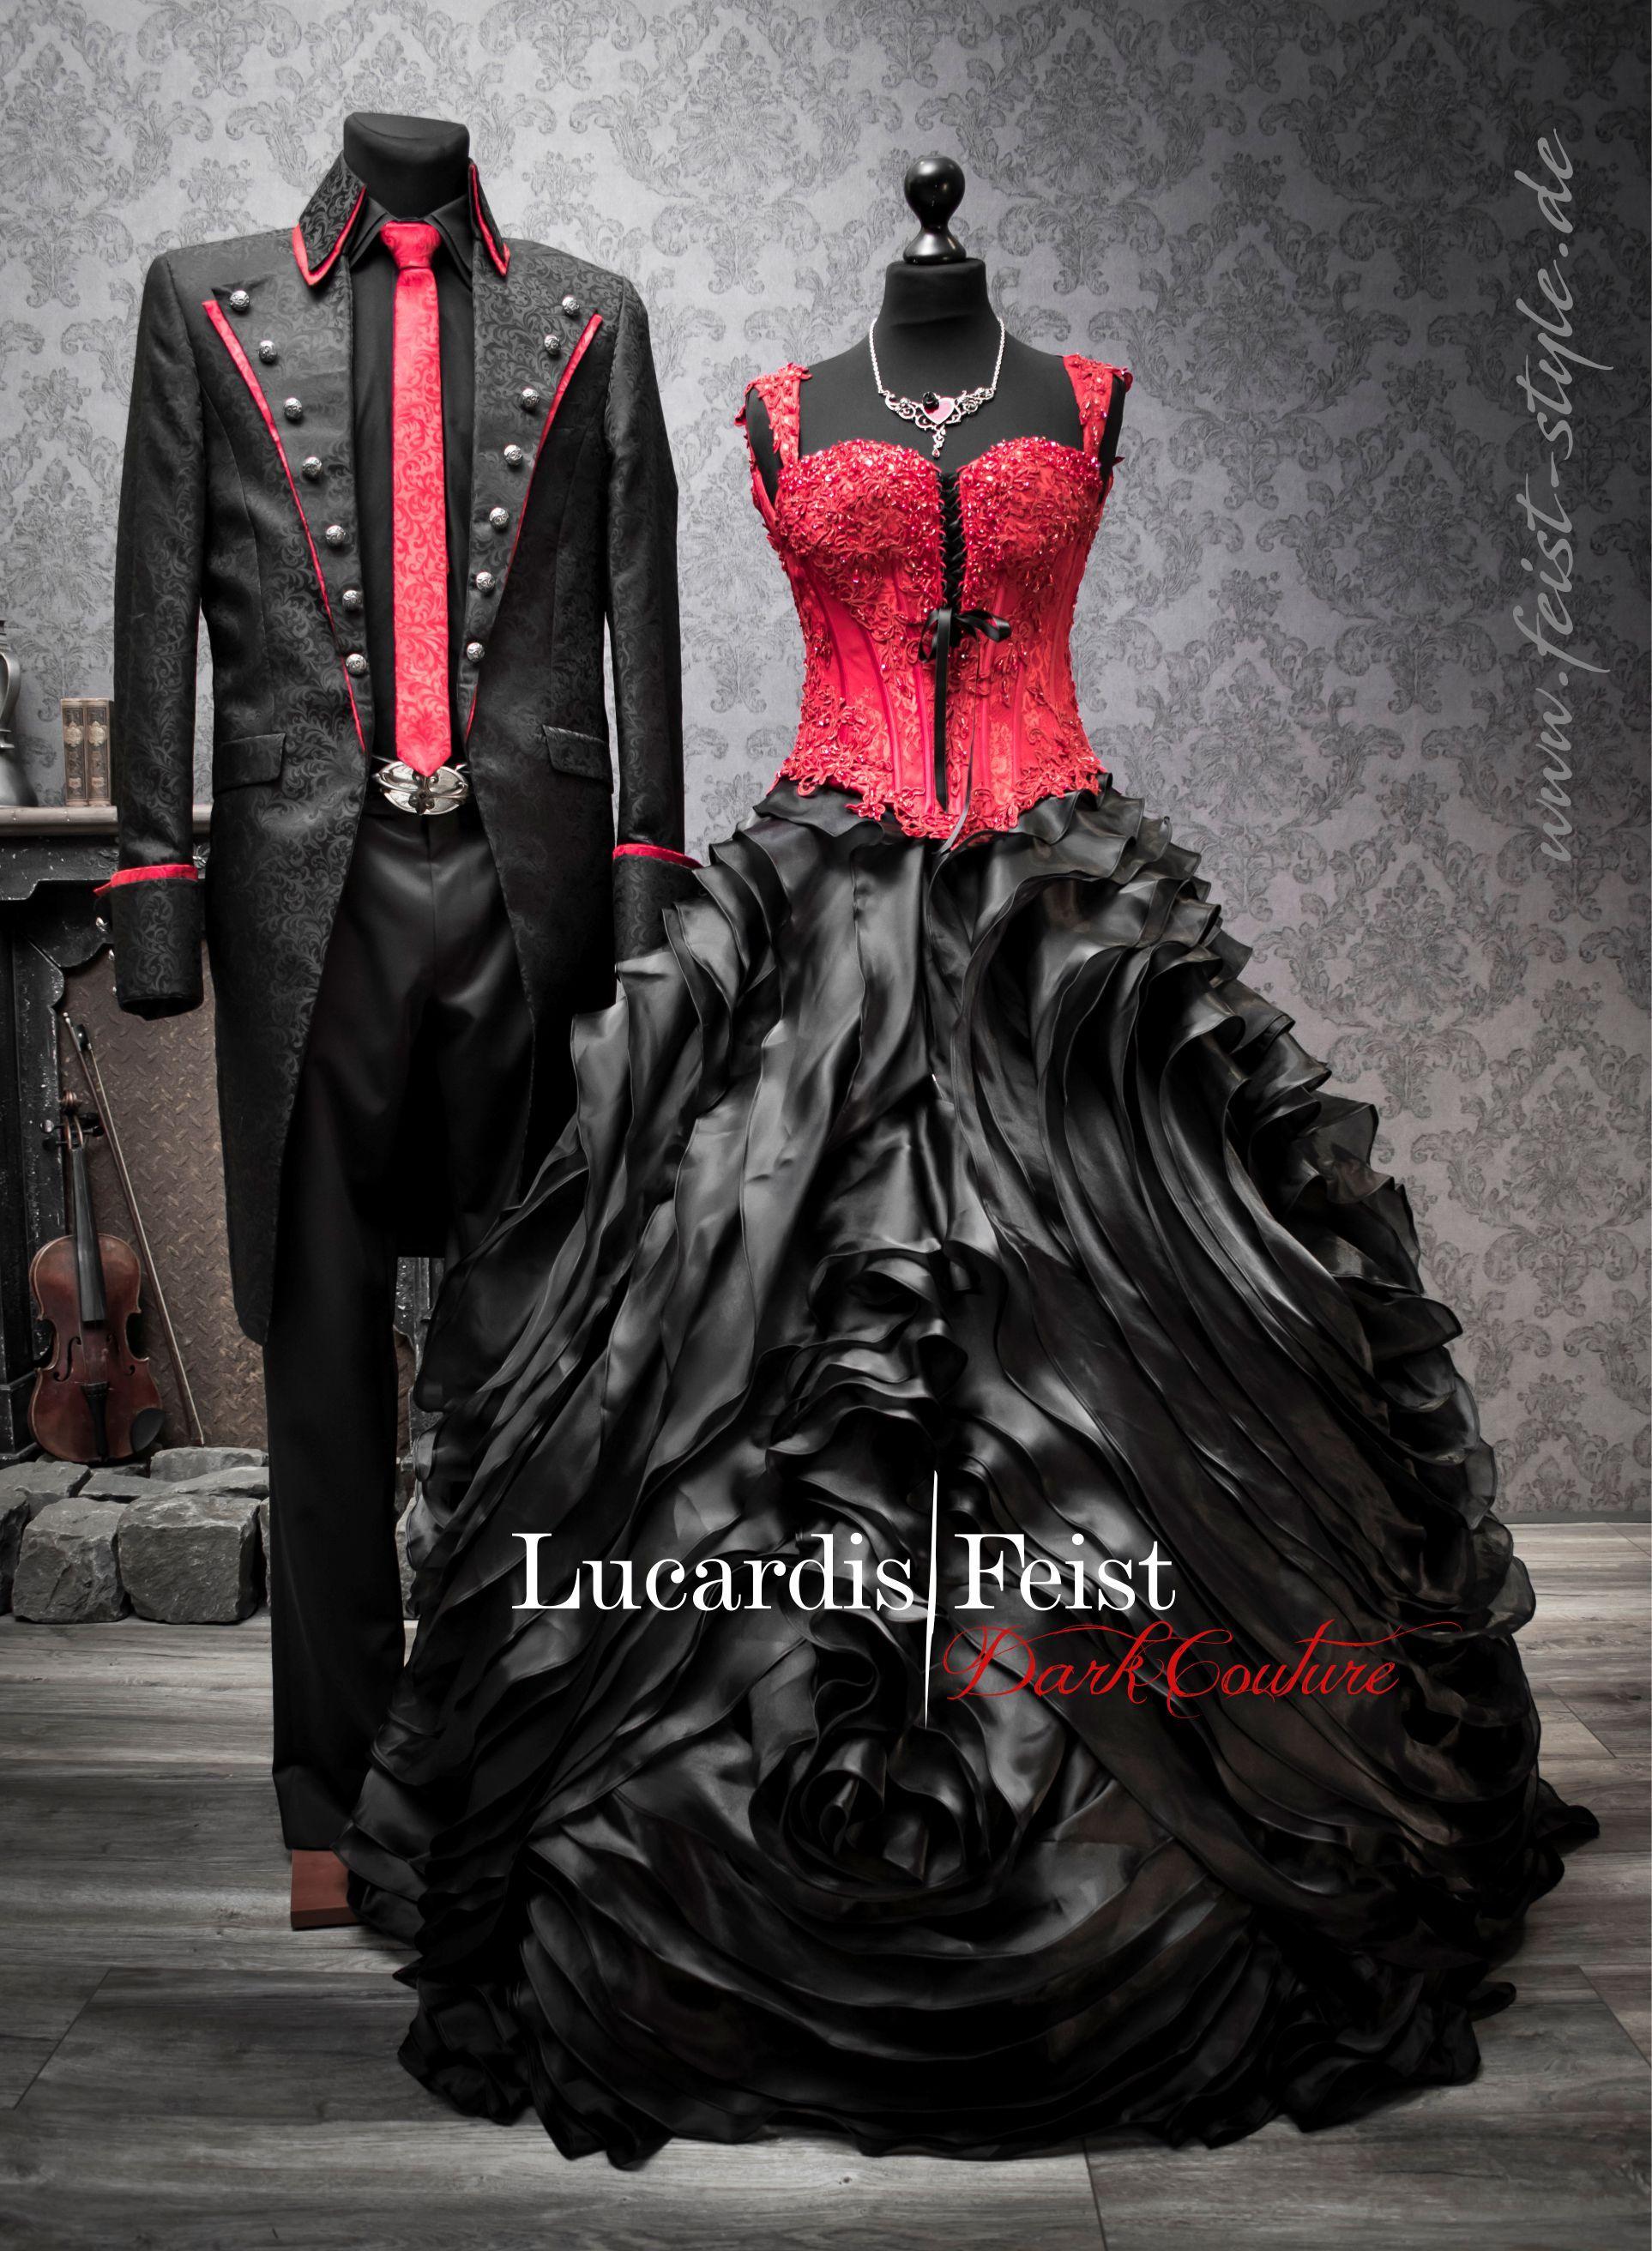 The Original: Lucardis Feist - Dark Couture The Designer for the